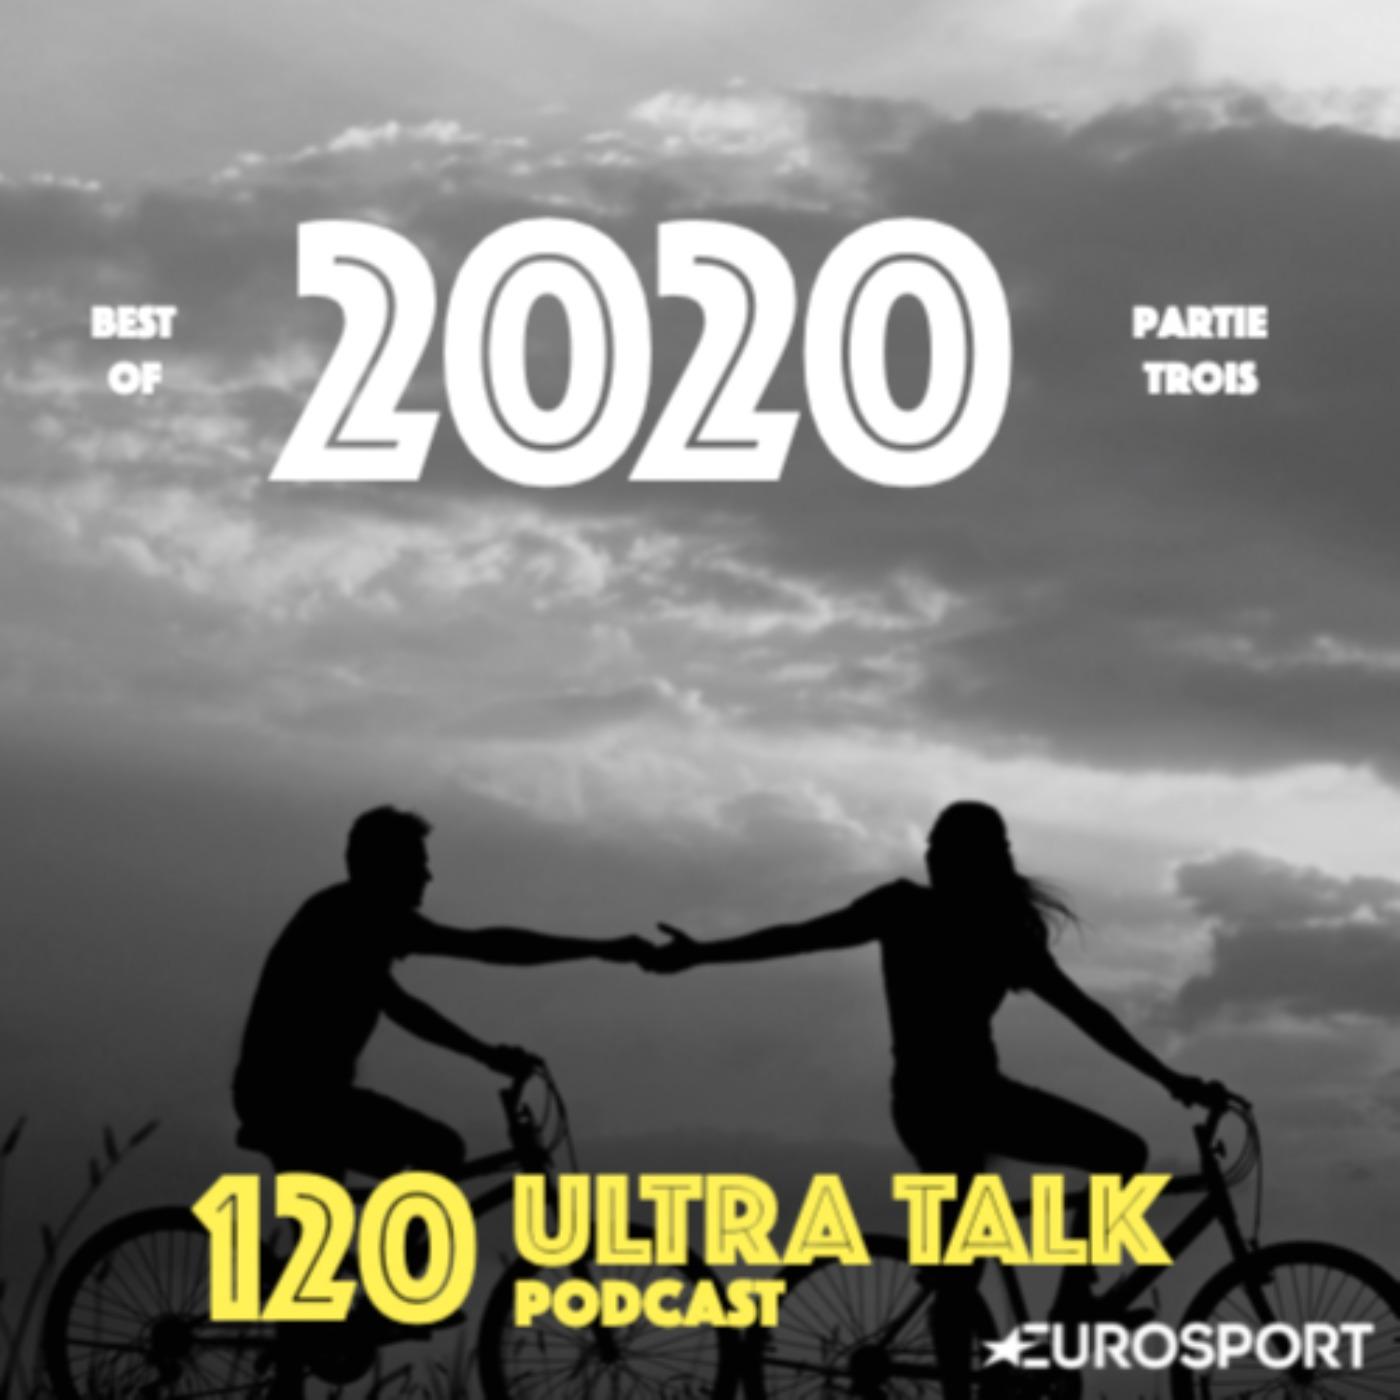 # 120 Best Of 2020 - Partie 3